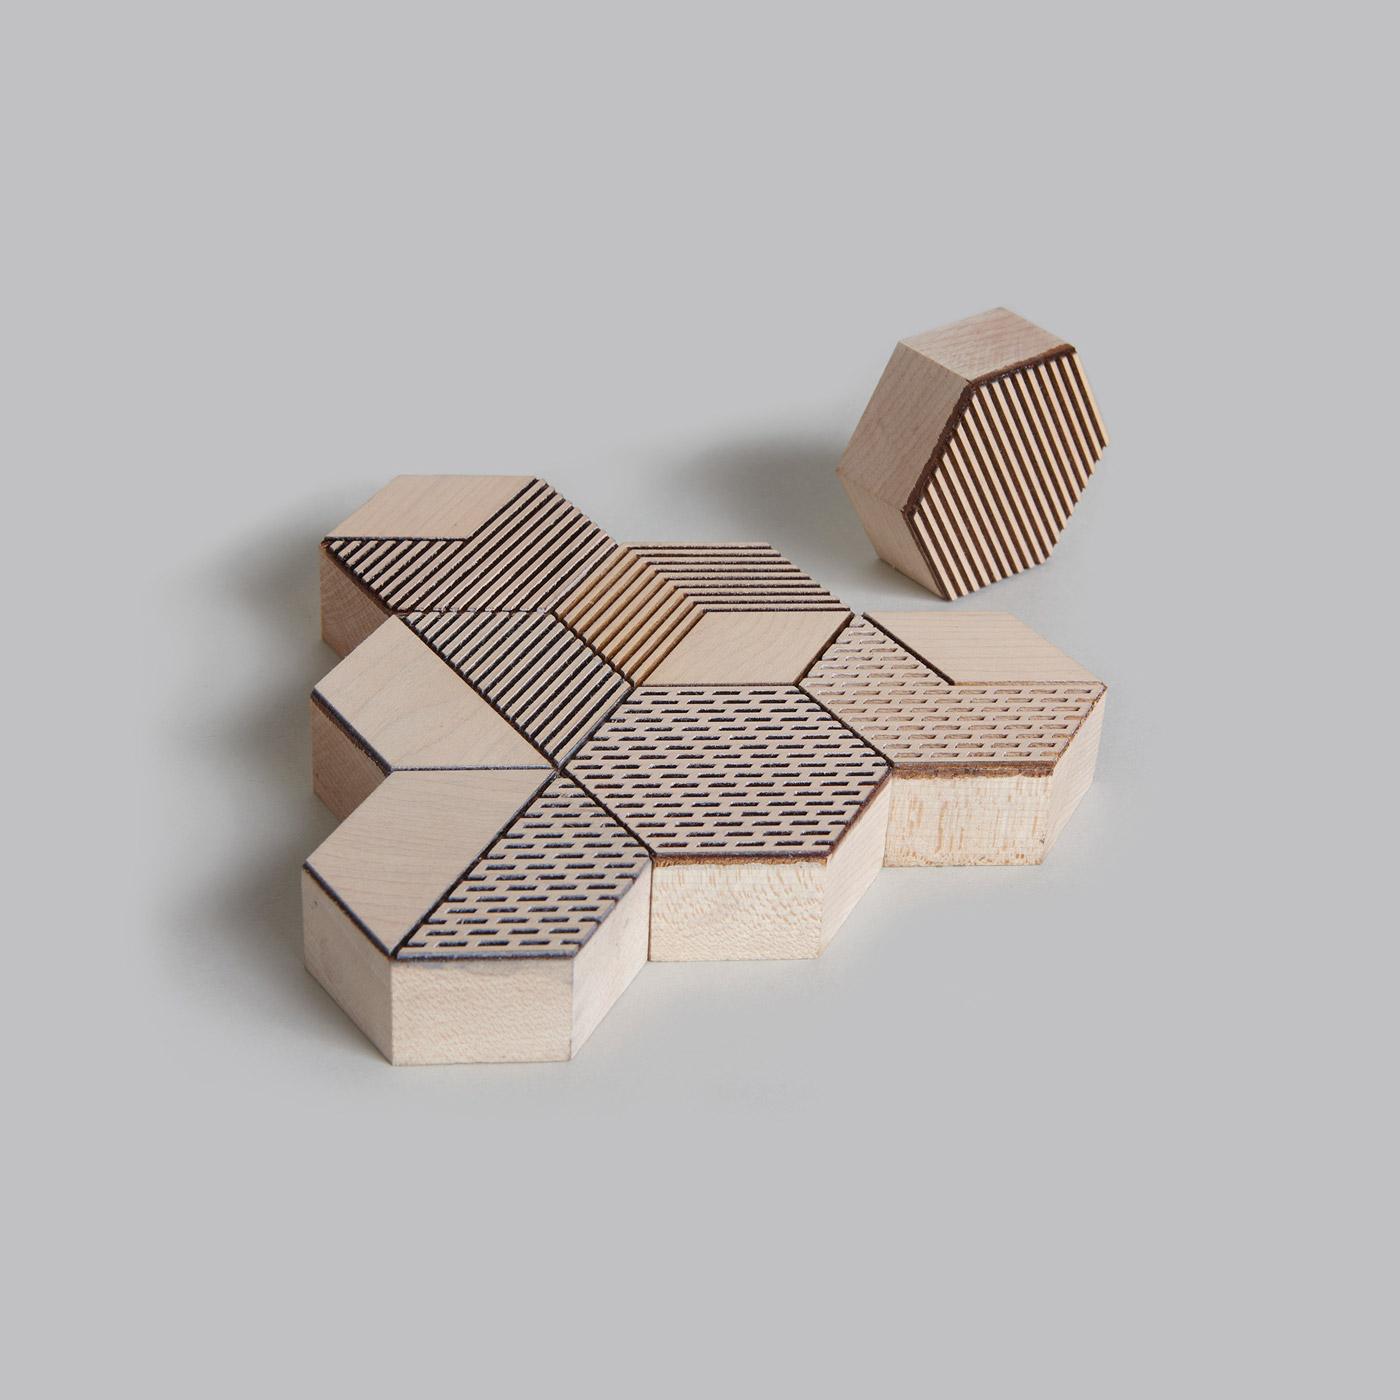 handcraft-series-thomas-mayo-goodfromyou-16.jpg